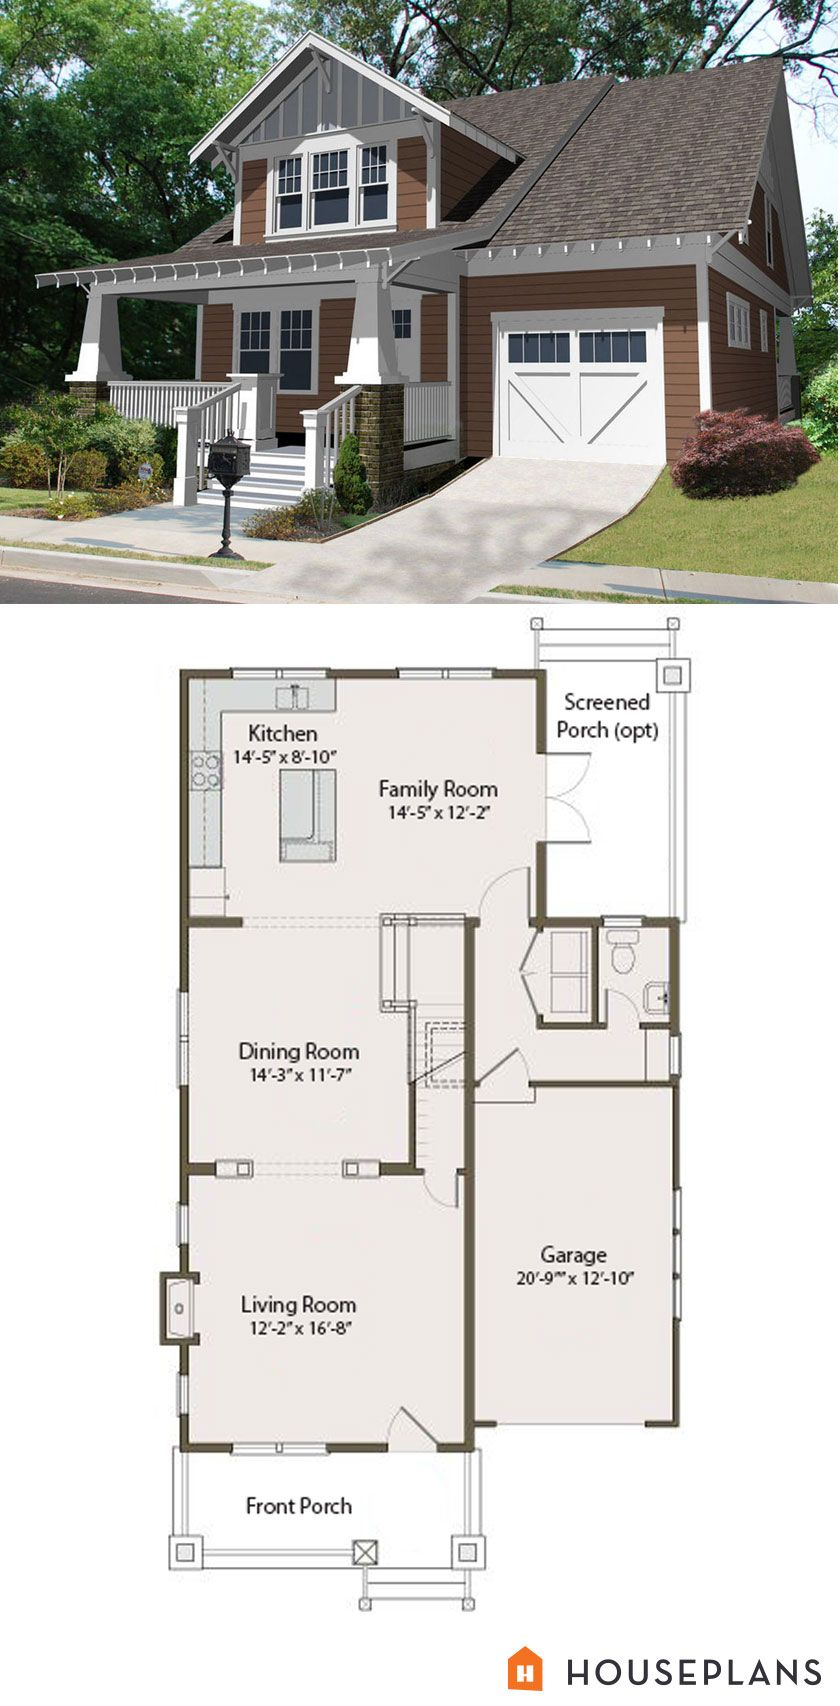 Craftsman Bungalow Floor Plan And Elevation 2100sft Plan 461 25